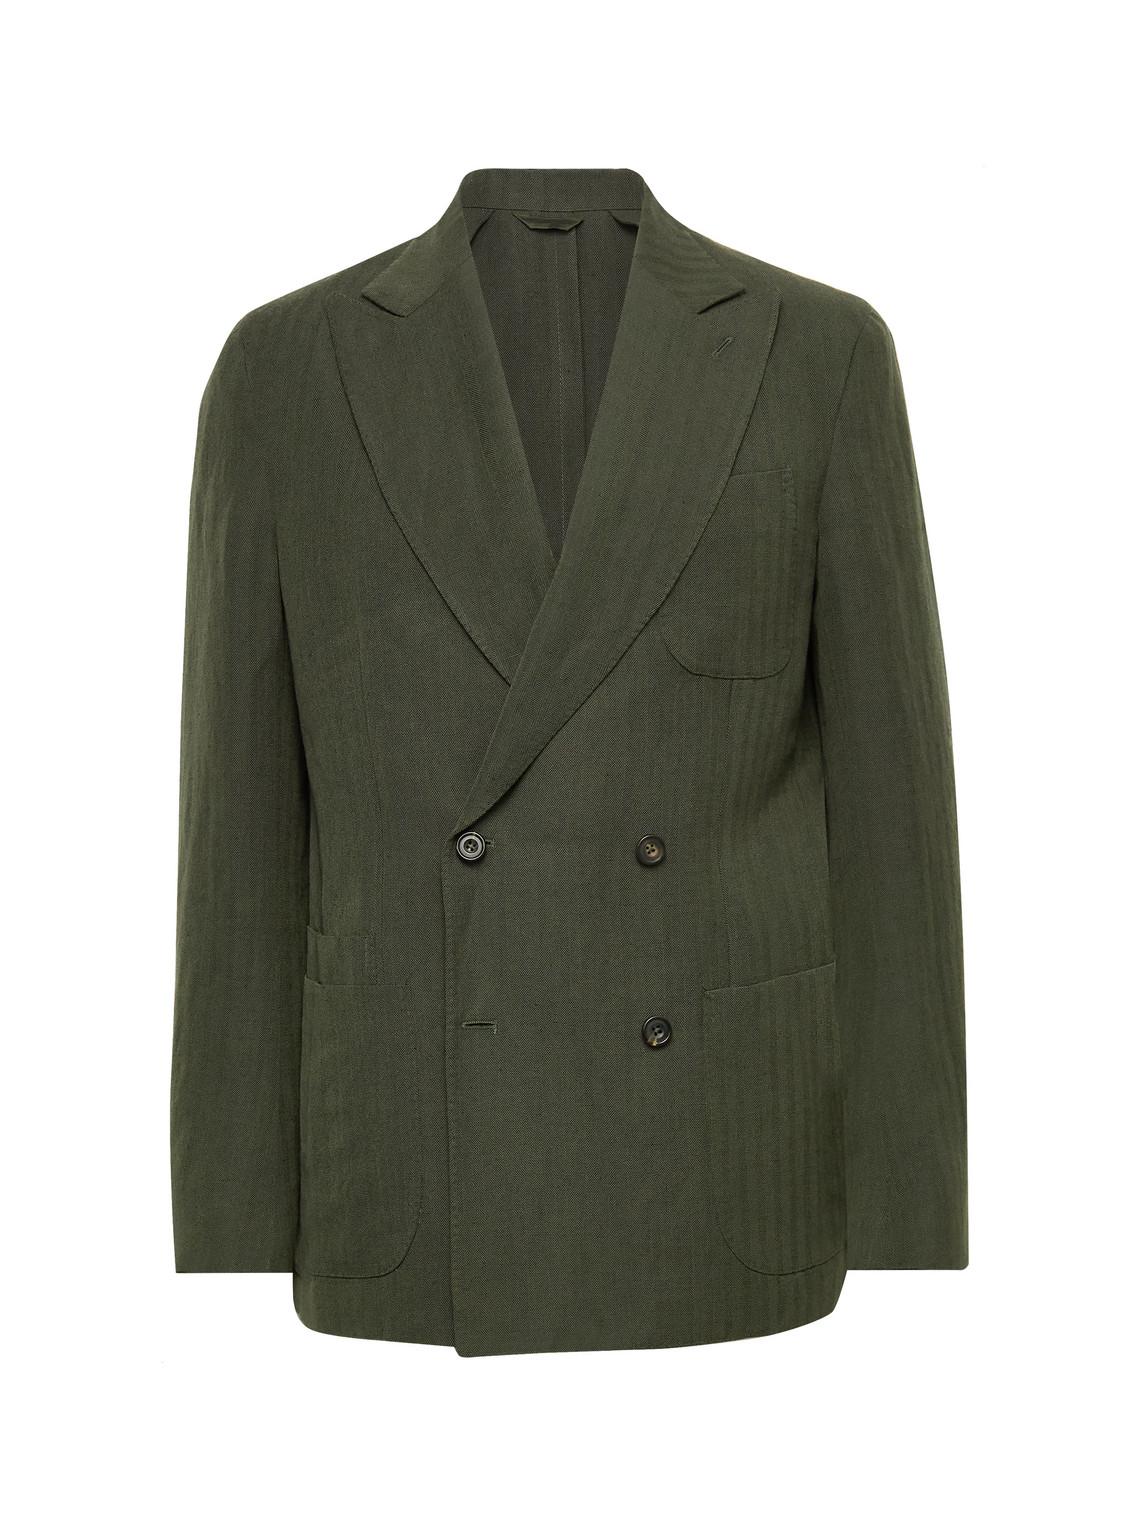 aimé leon dore - drake's double-breasted herringbone wool and linen-blend suit jacket - men - green - uk/us 50